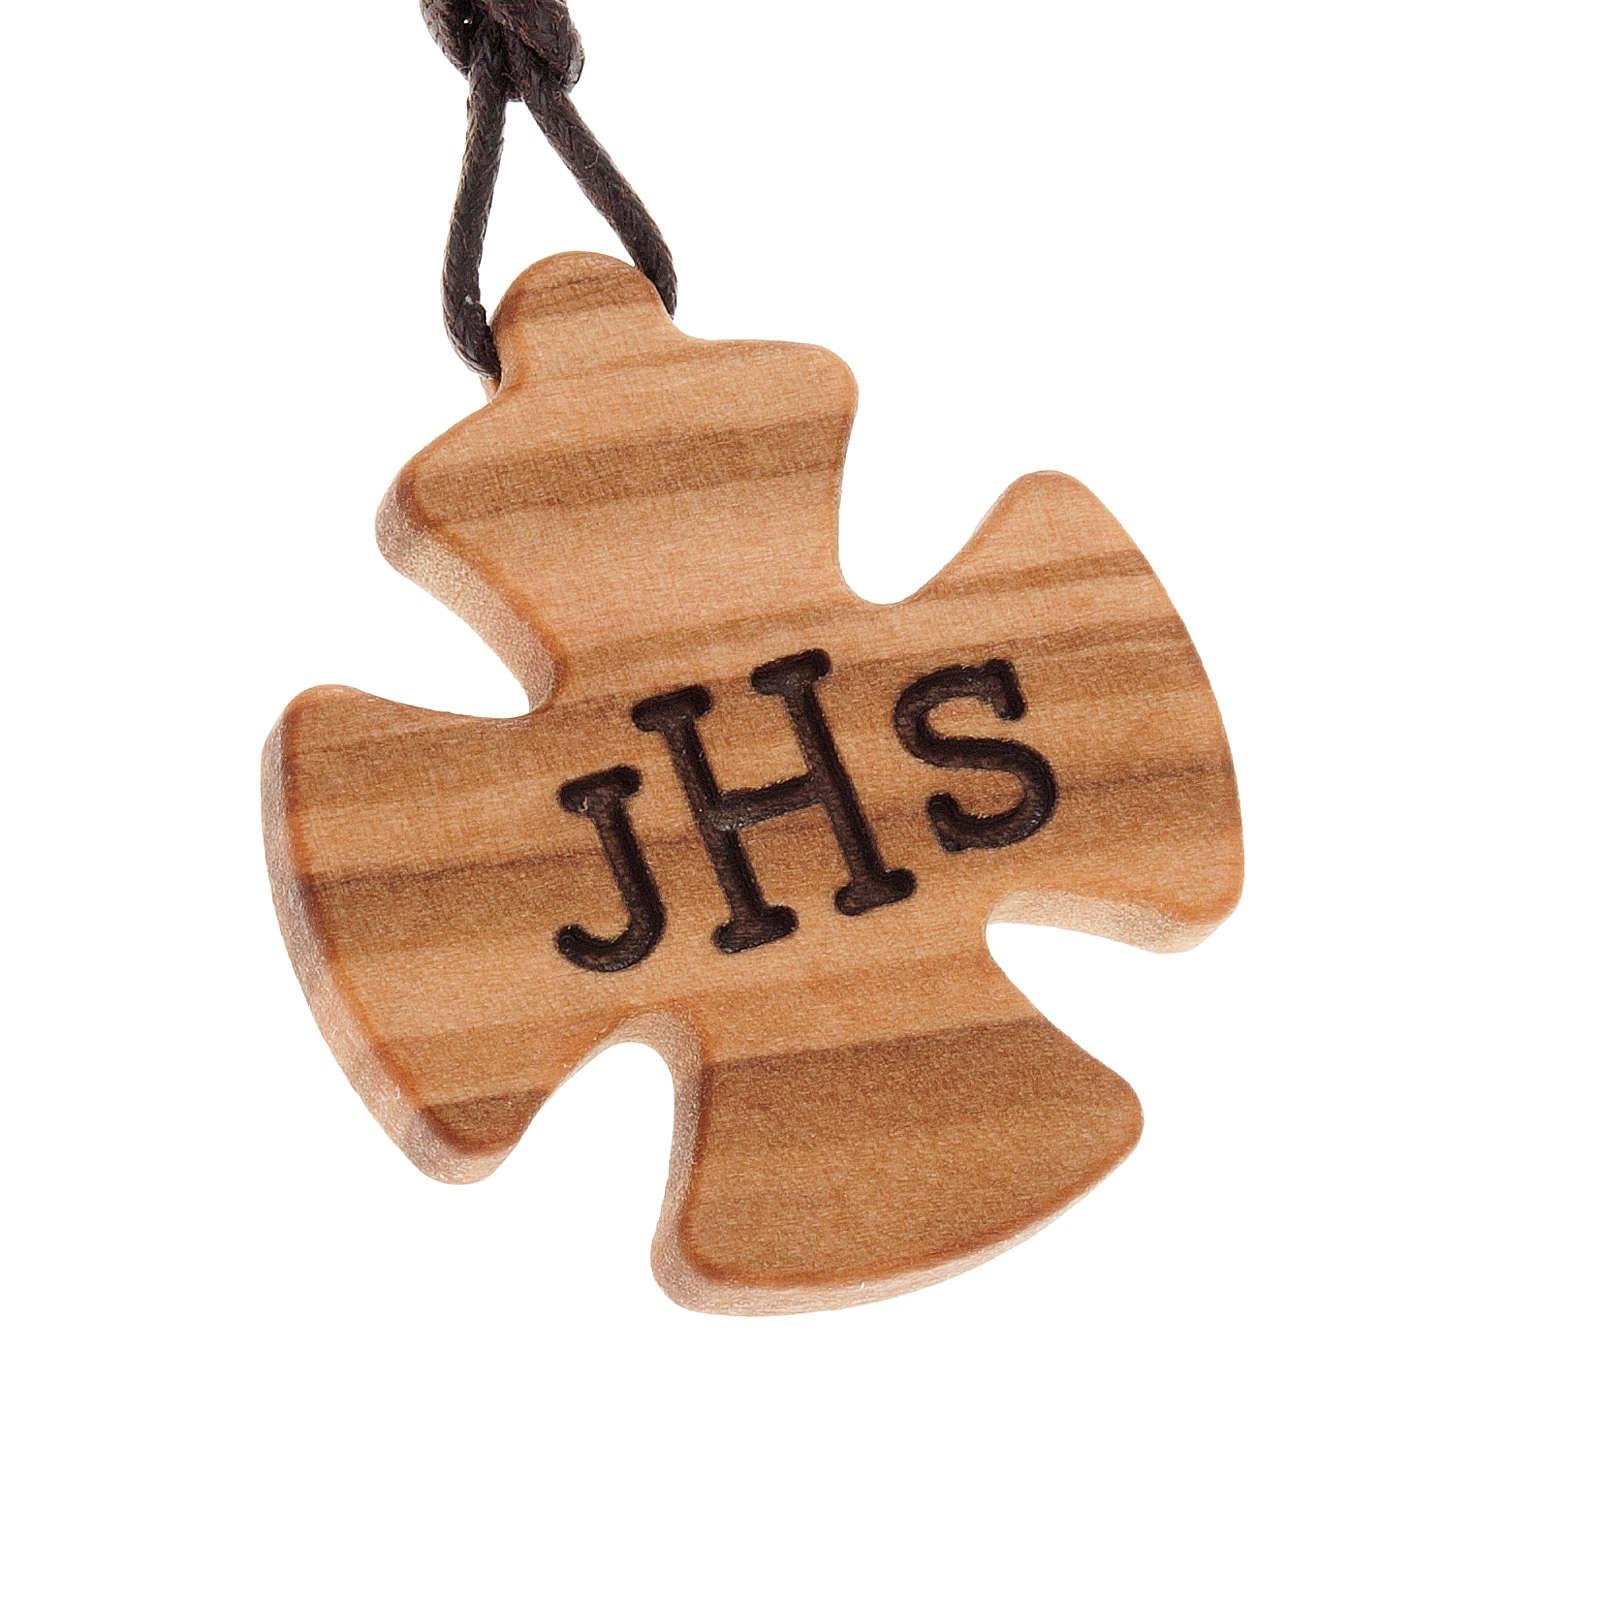 Cruz olivo incidido JHS 4